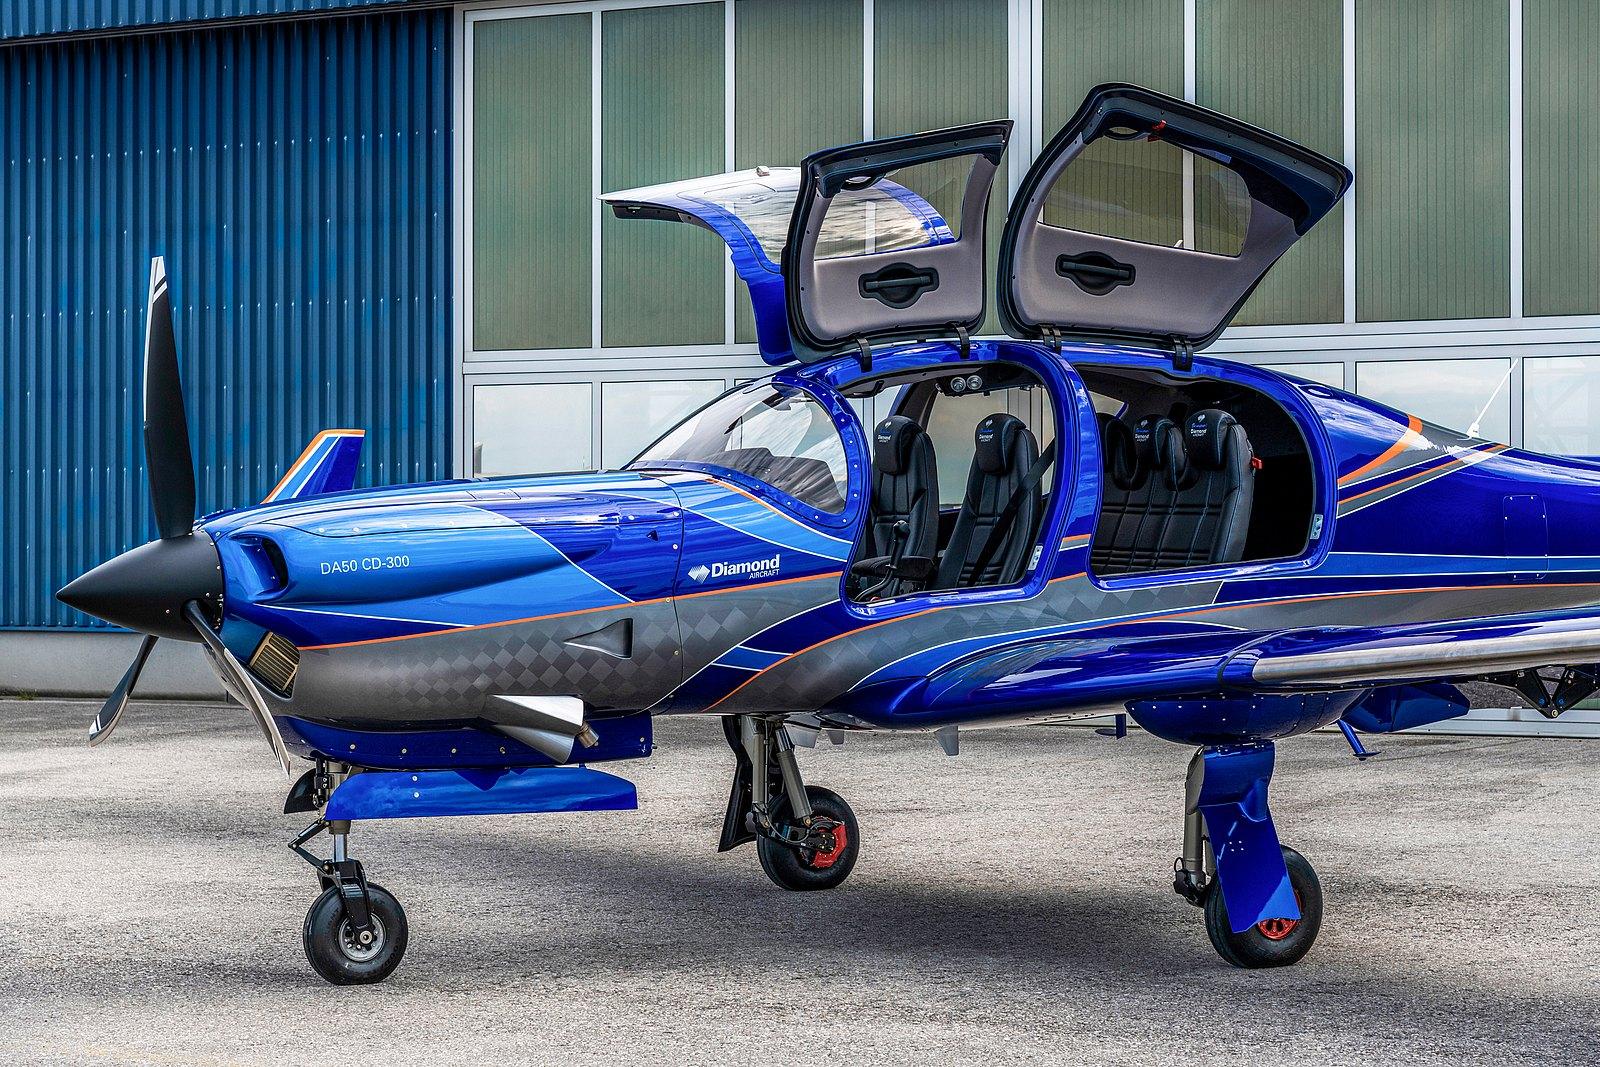 Самолет Diamond DA50 RG